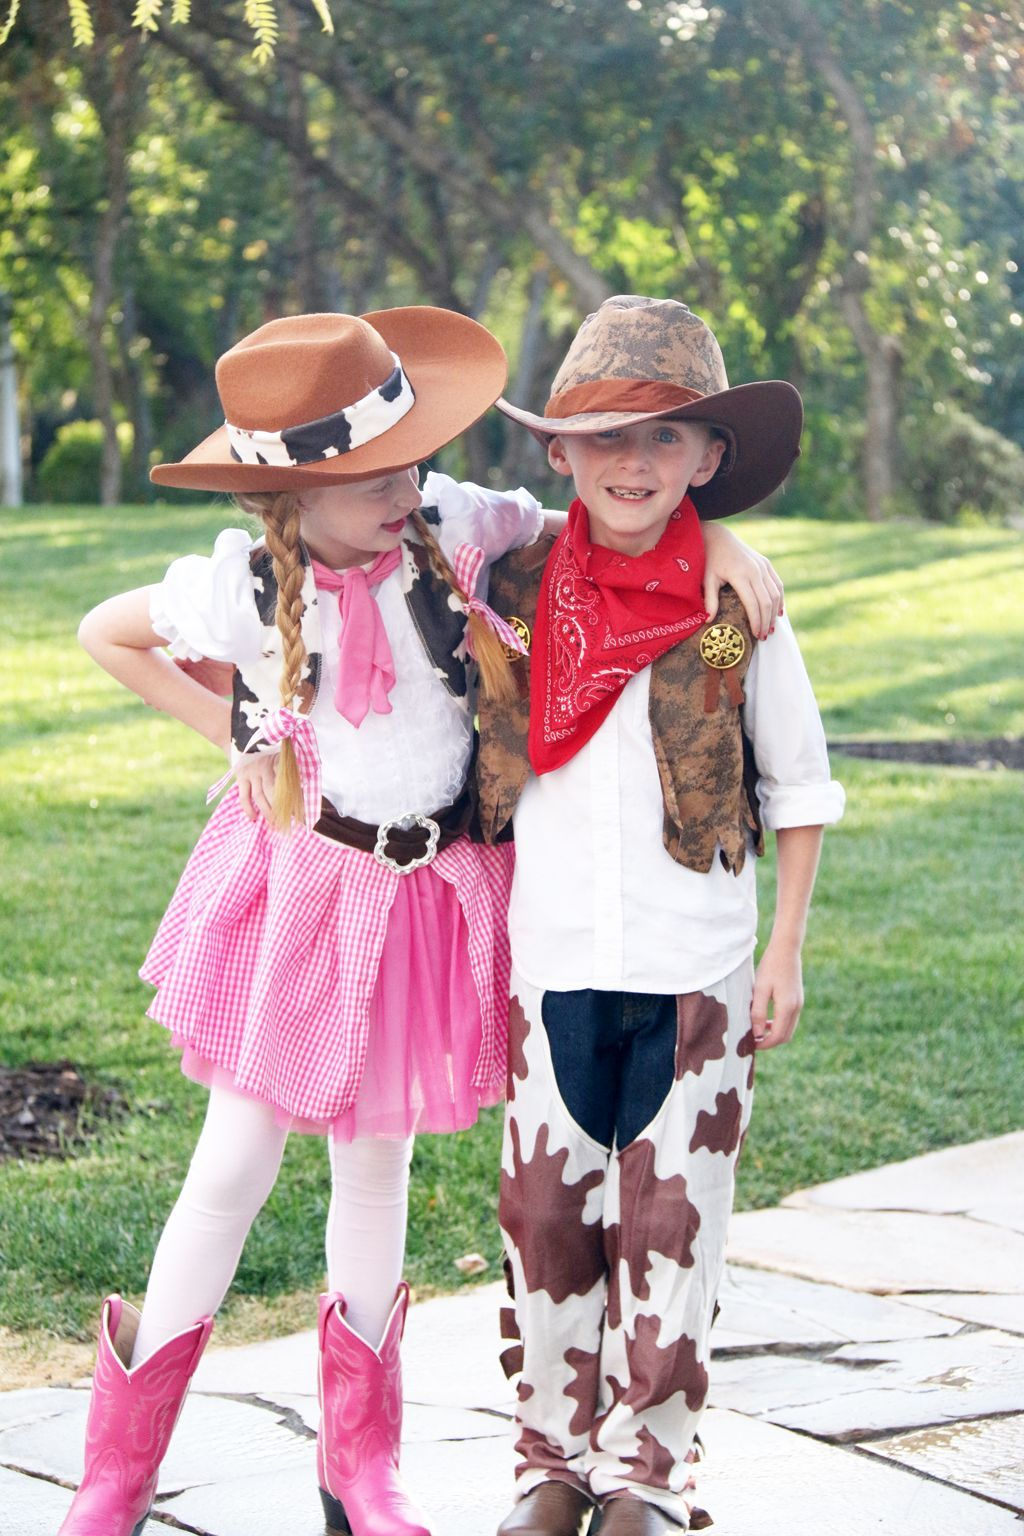 Boy Girl Twin Costume Idea-Cowgirl and Cowboy | Twin ...